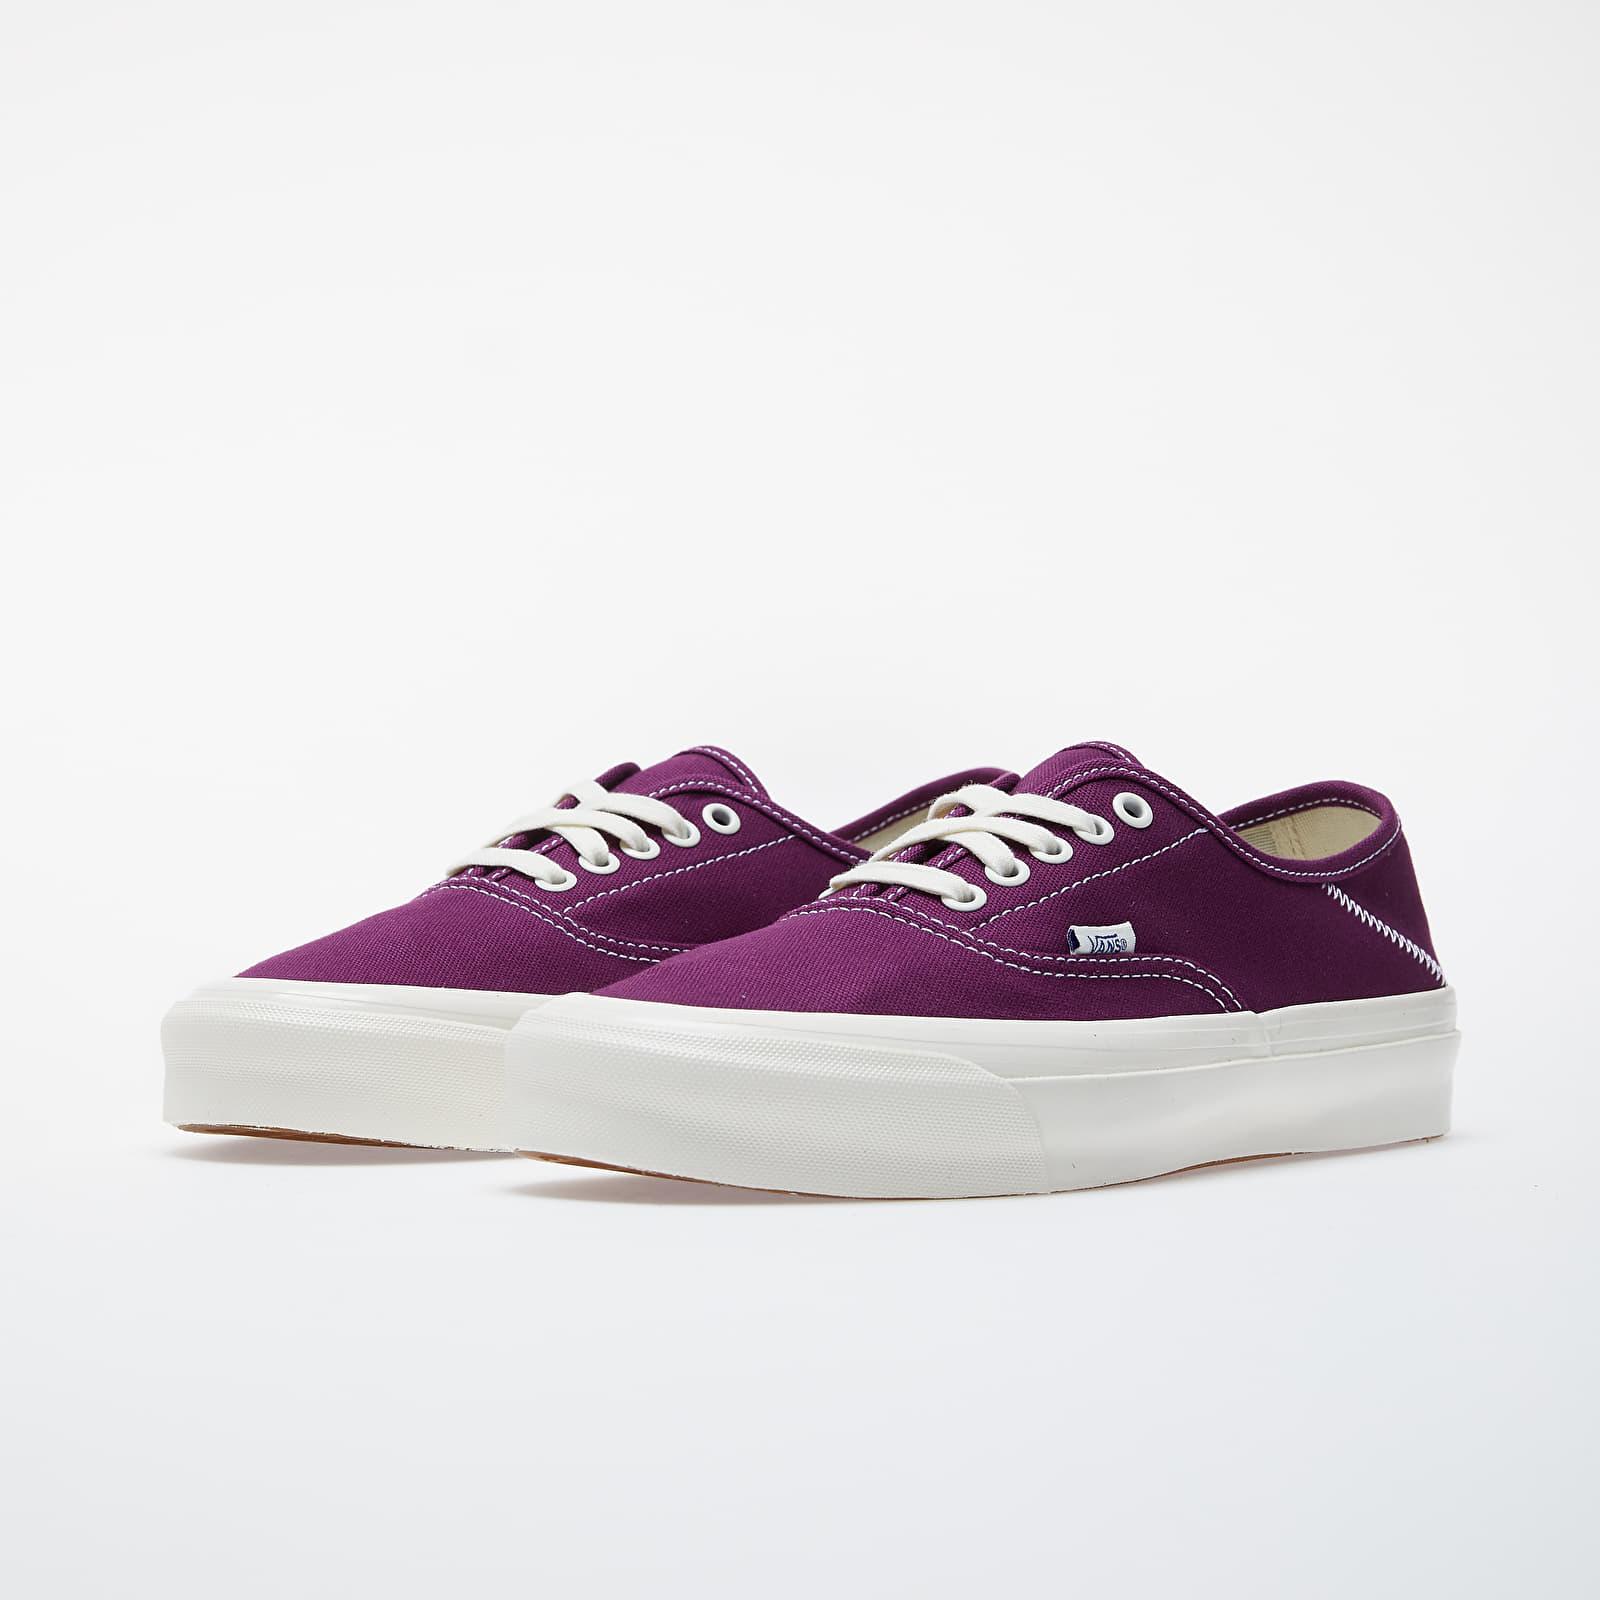 Vans OG Style 43 LX (Canvas) Dark Purple Marshmallow | Footshop